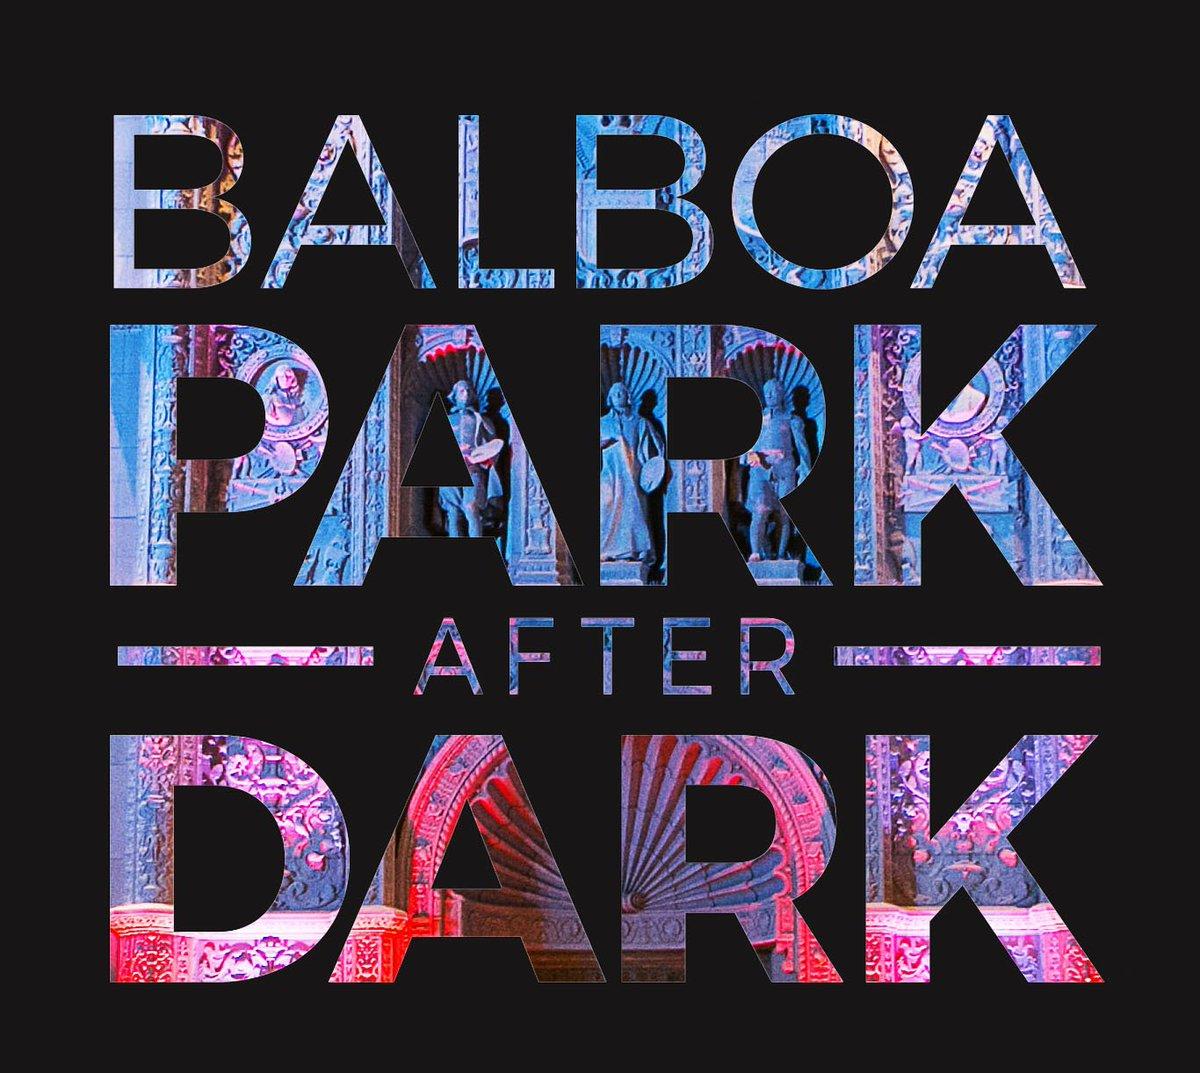 #BalboaParkAfterDark kicks off this Friday! Get all the details at https://t.co/oyYnavHgZv. https://t.co/oOJykVzLhA